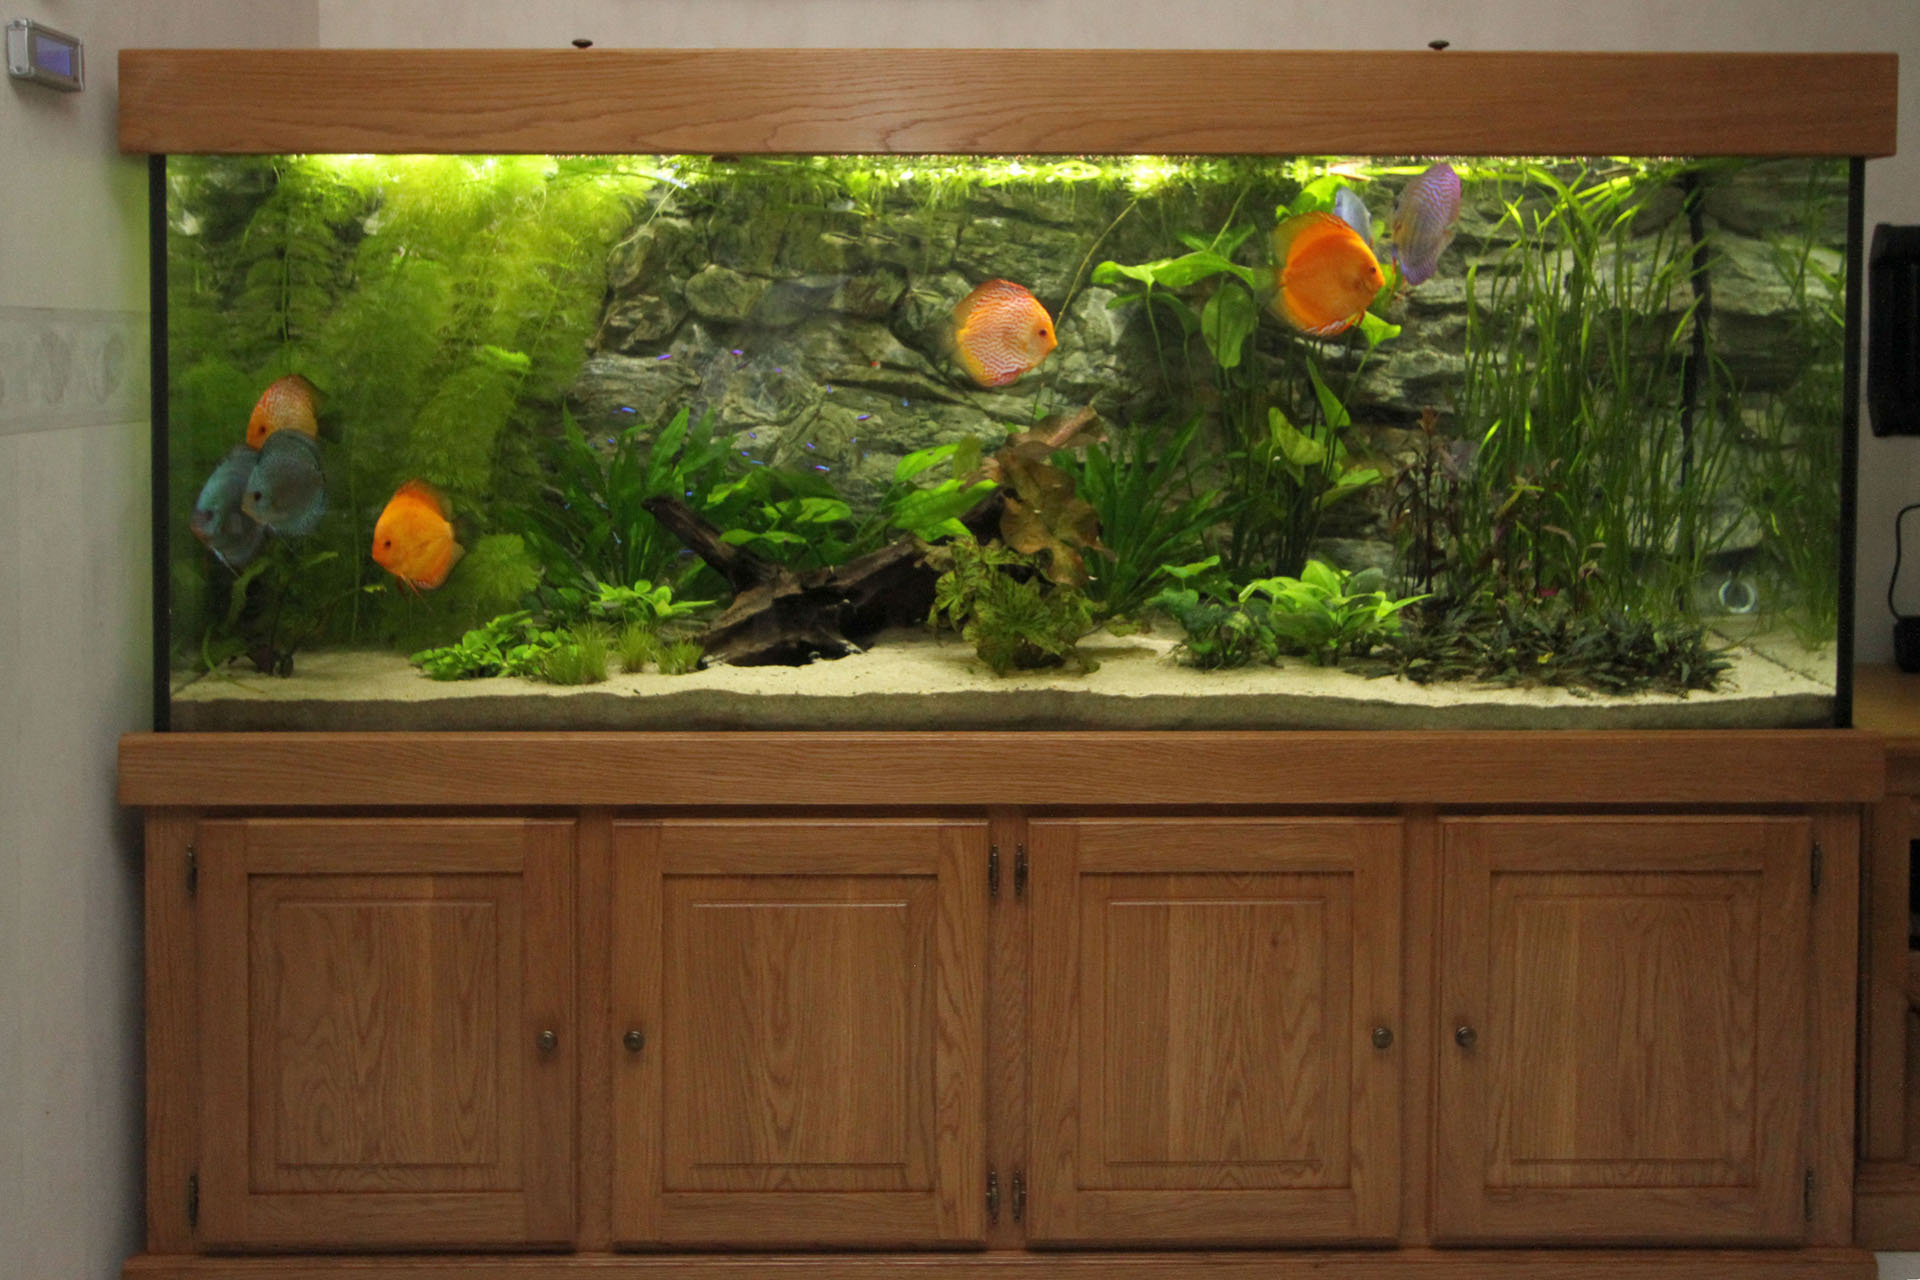 Vooraanzicht eiken show aquarium met Stendker discusvissen